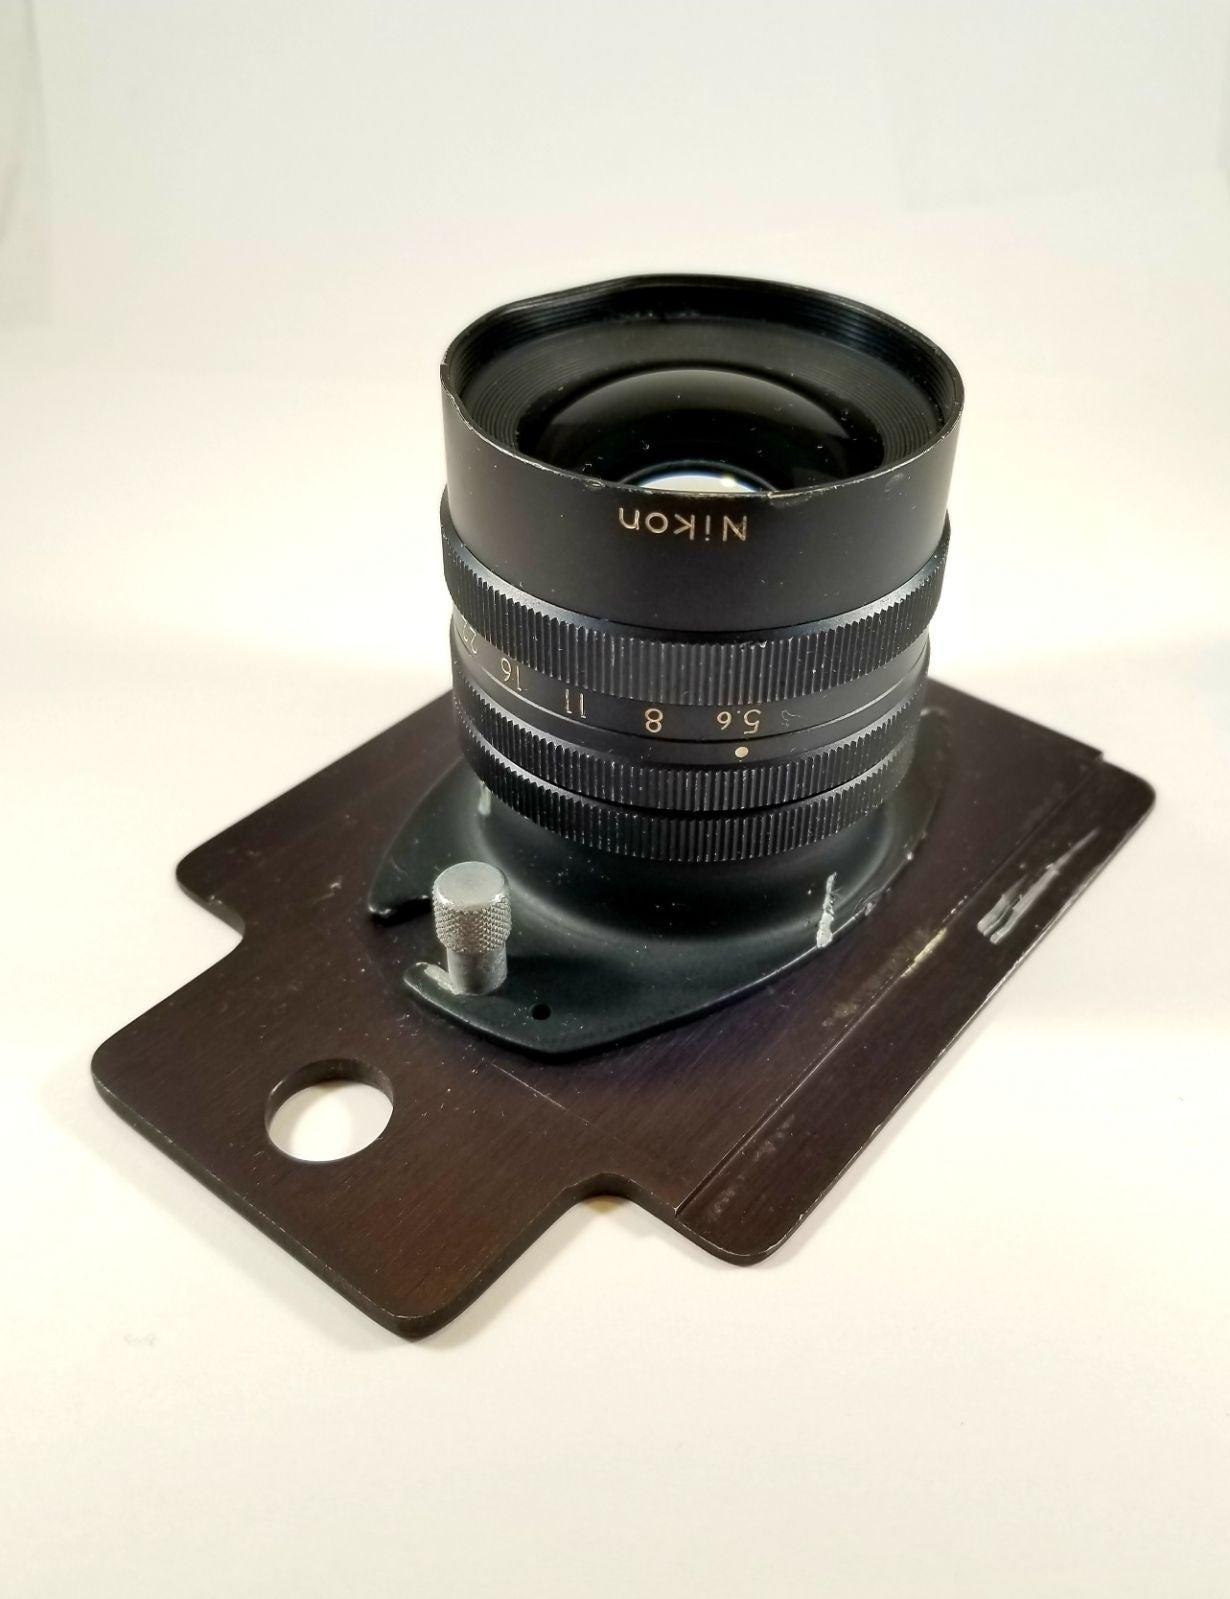 NIKON EL-NIKKOR 150mm 1:5.6 Enlarger Len